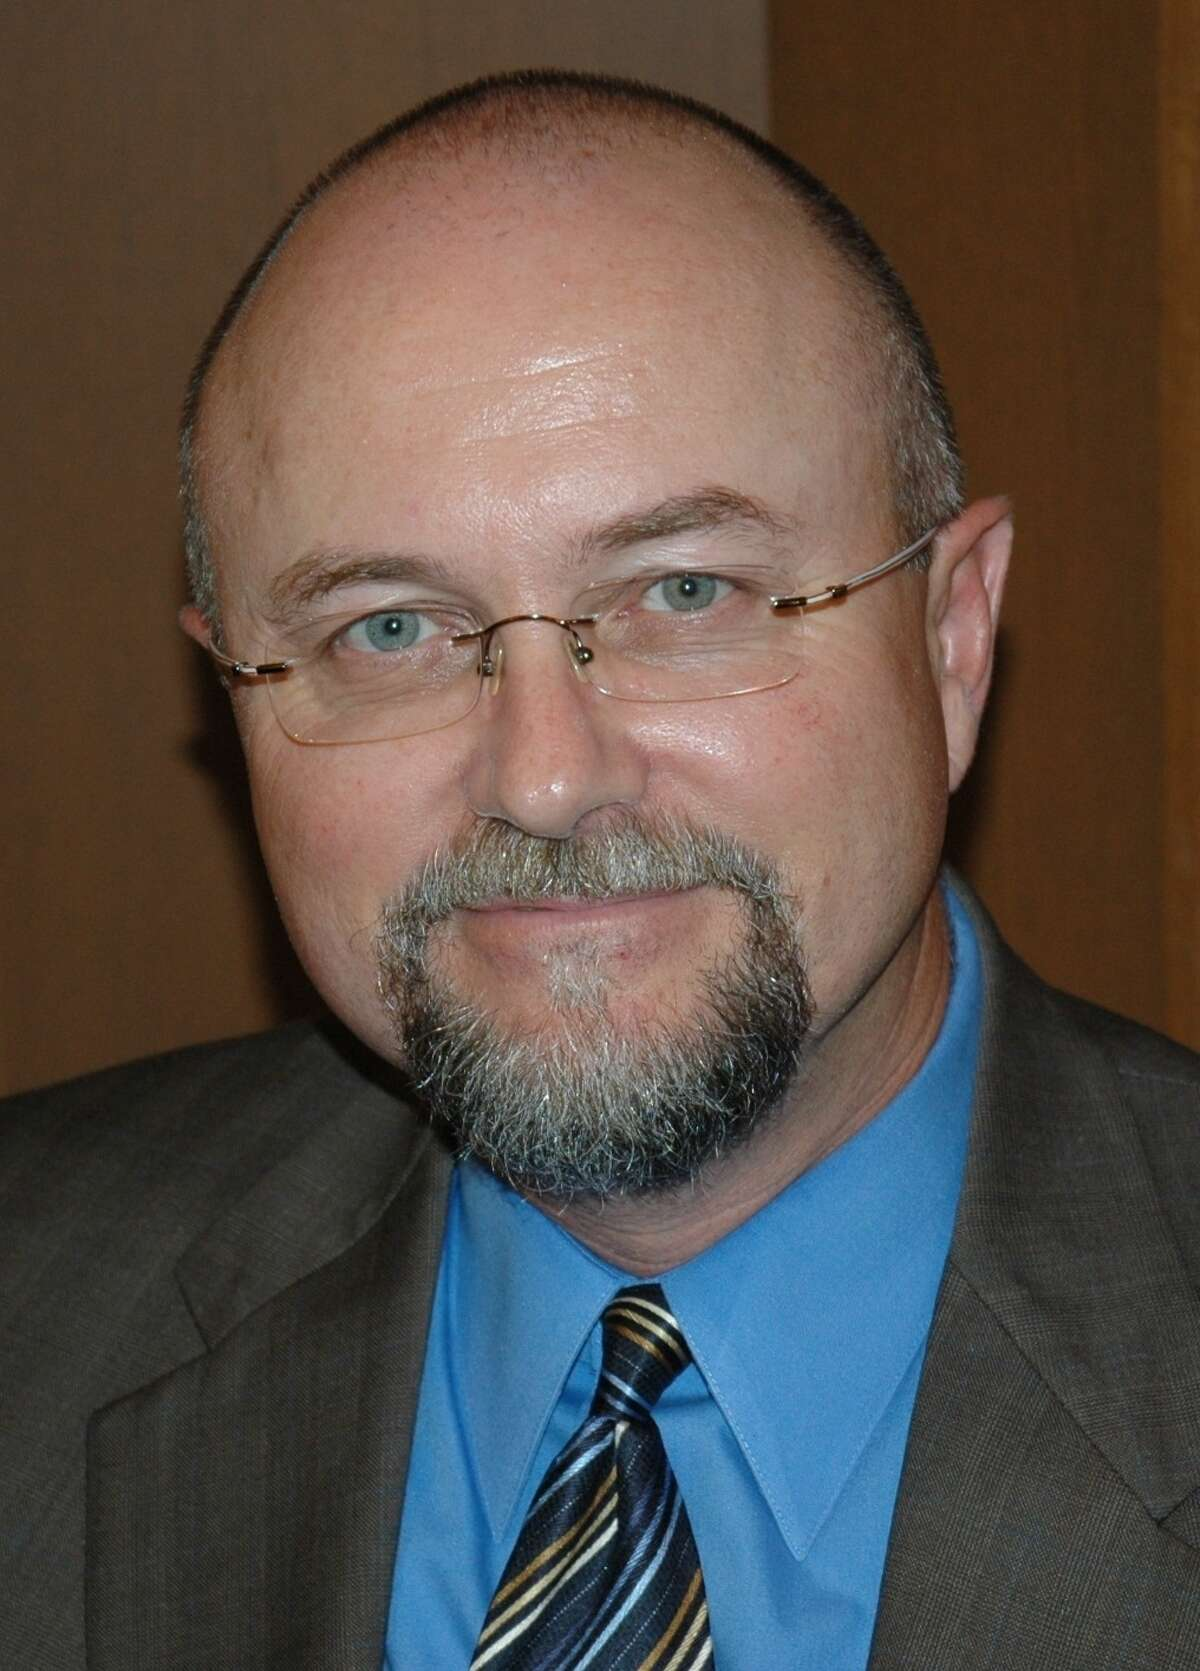 Ric Baser, new president of Northwest Vista College (July 2014)